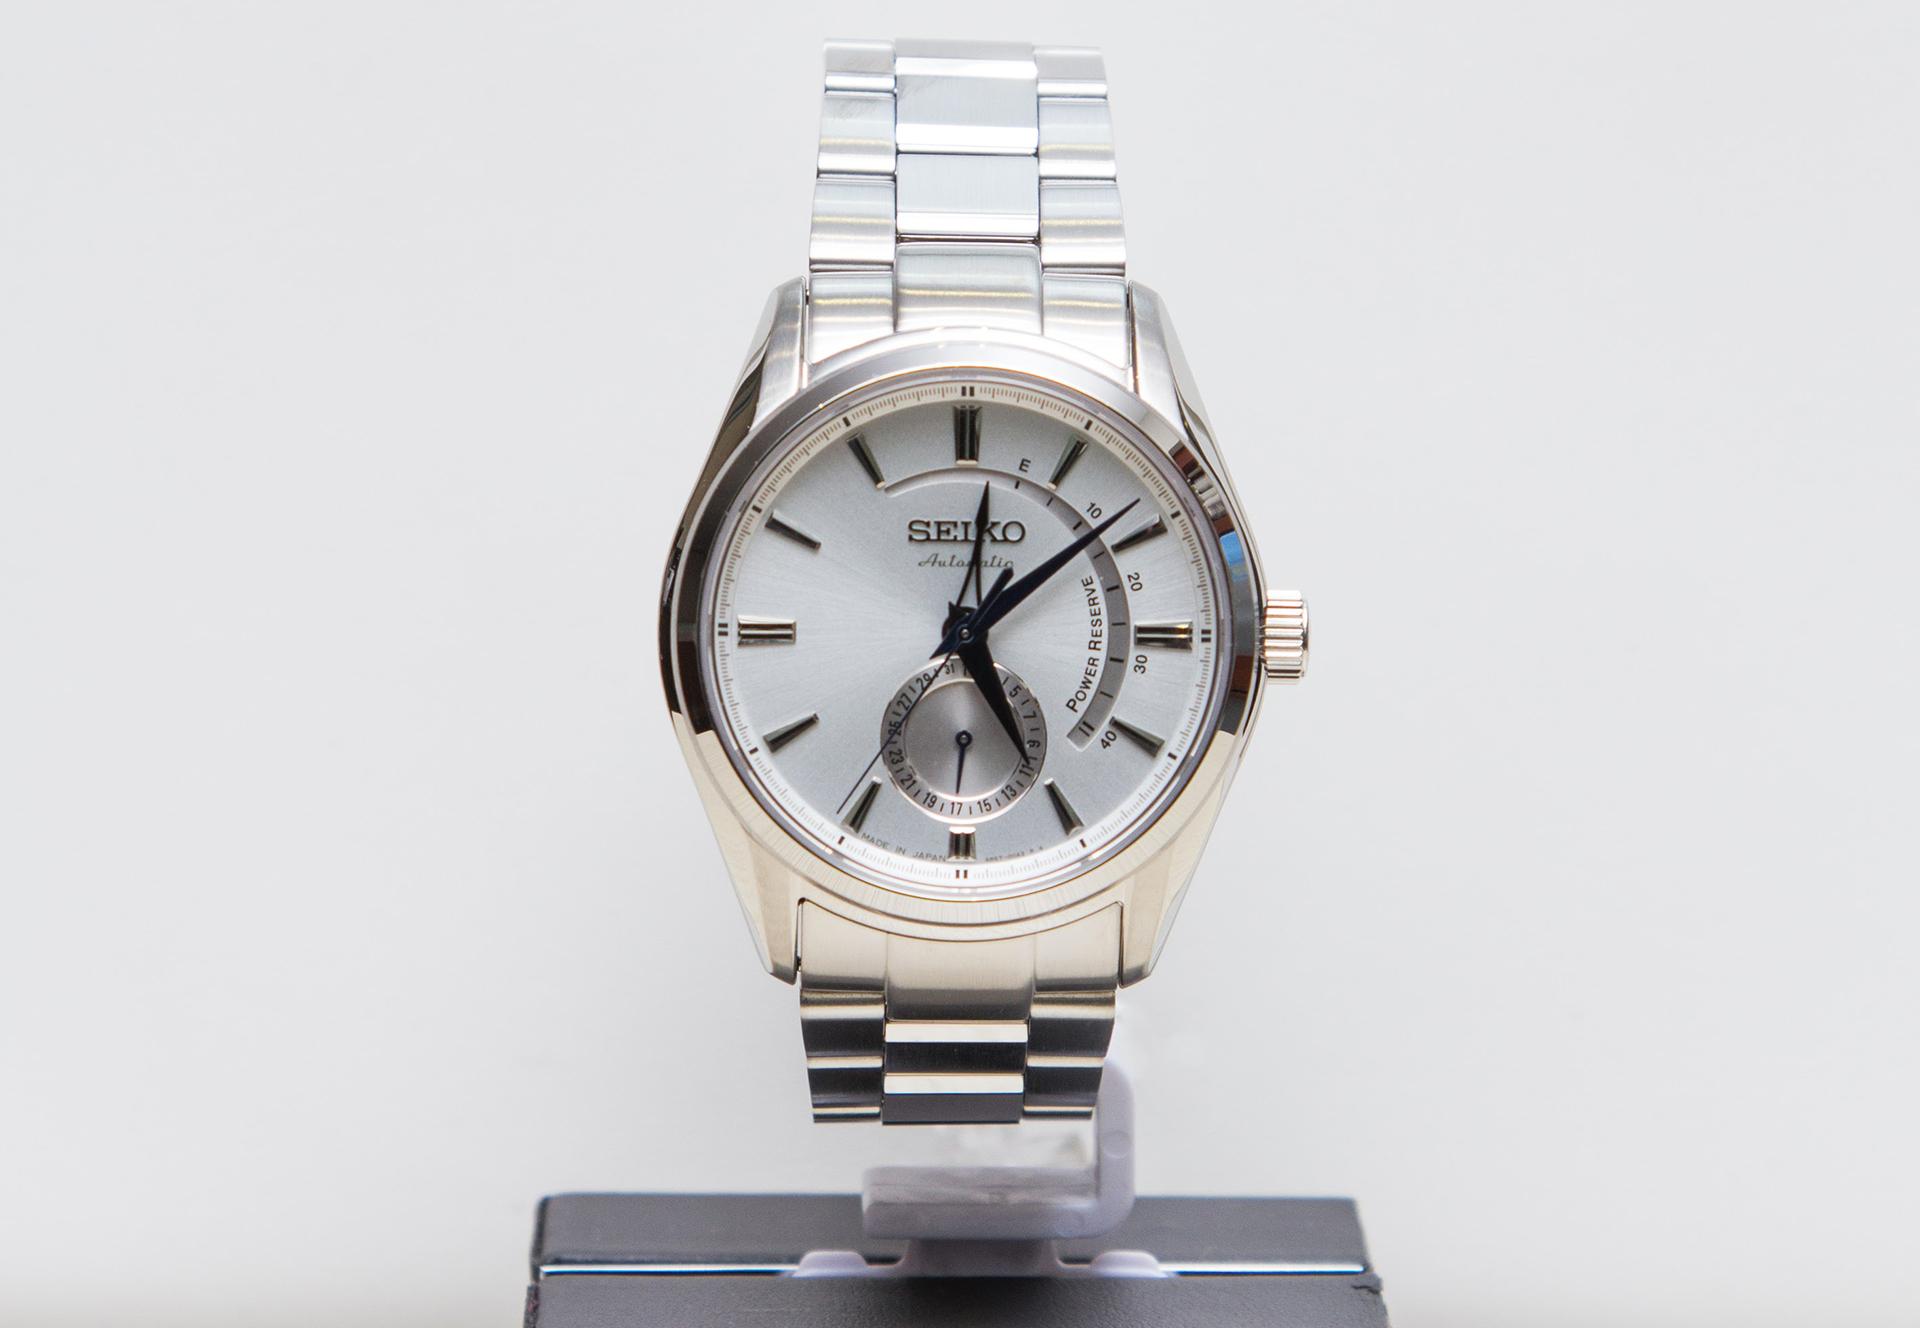 bijouterie-verneau-horlogerie-la-garde-toulon-var-seiko-montre